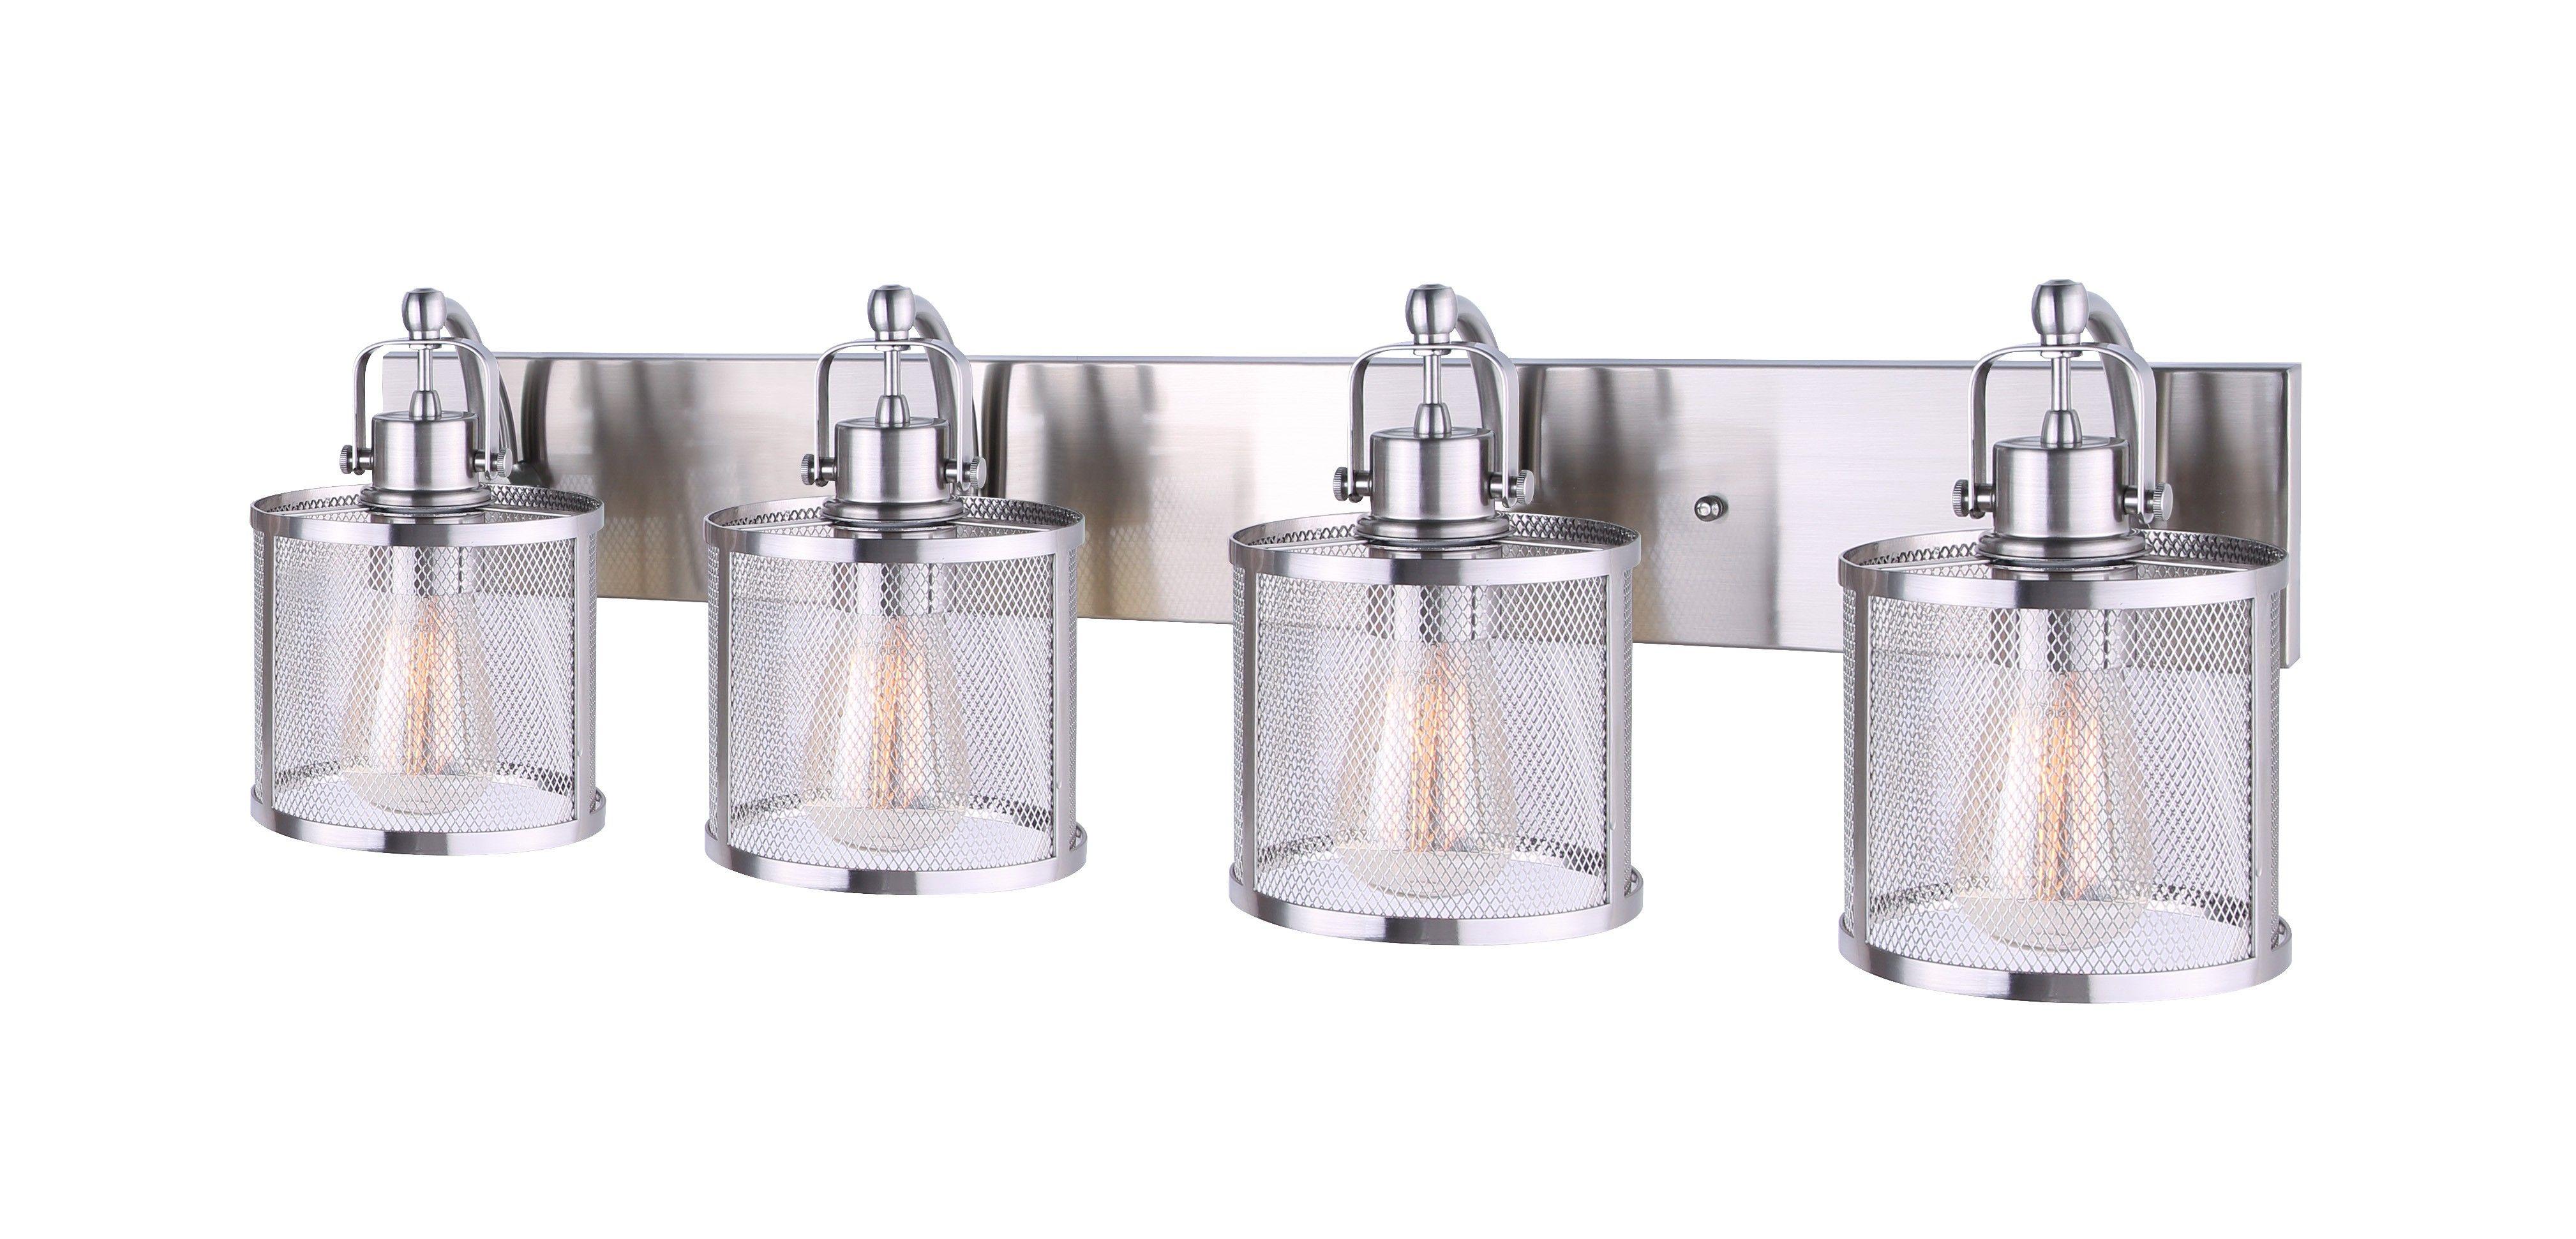 Canarm Ivl626a04bn Beckett 4 Light Vanity Brushed Nickel Brushed Nickel Vanity Lighting Vanity Light Fixtures